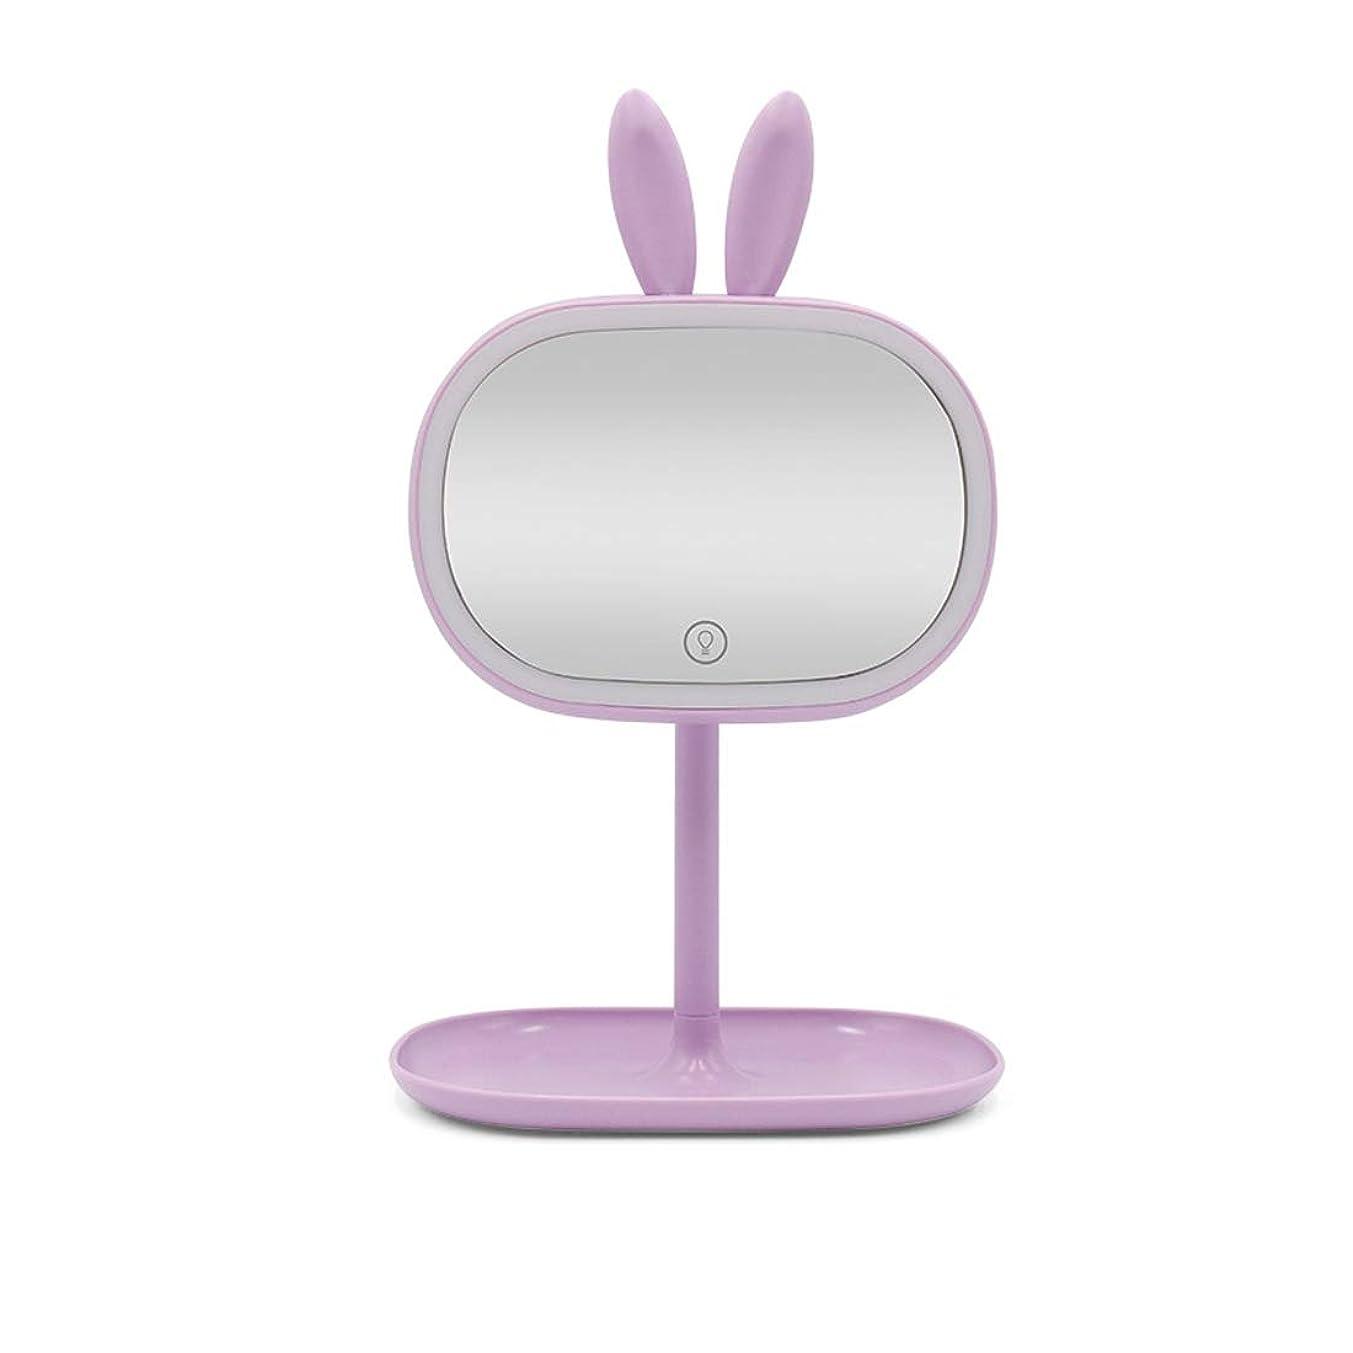 Gloriza 化粧鏡 LEDライト付き メイクアップミラー タッチパネル?3段階明るさ調節可能 90度回転 収納スペース付き USB充電式 可愛いウサギ 卓上ミラー (パープル)